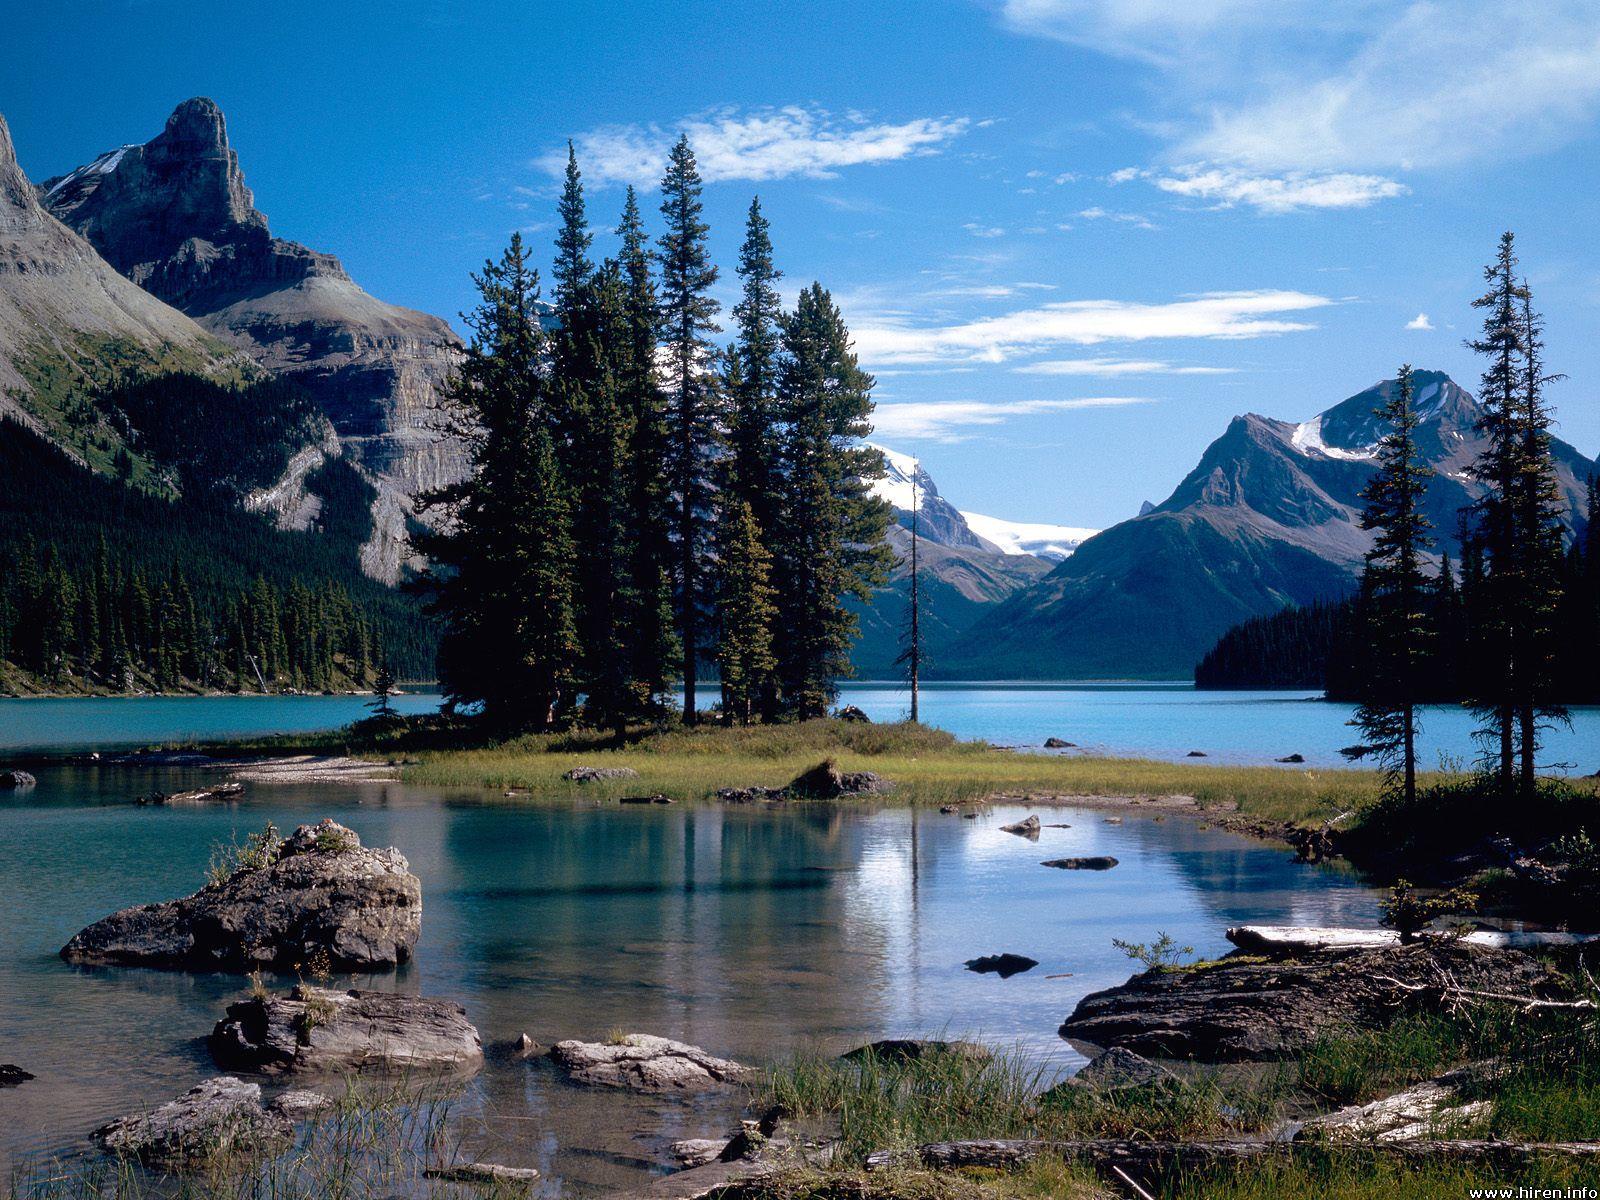 nationalpark alberta kanada - photo #19